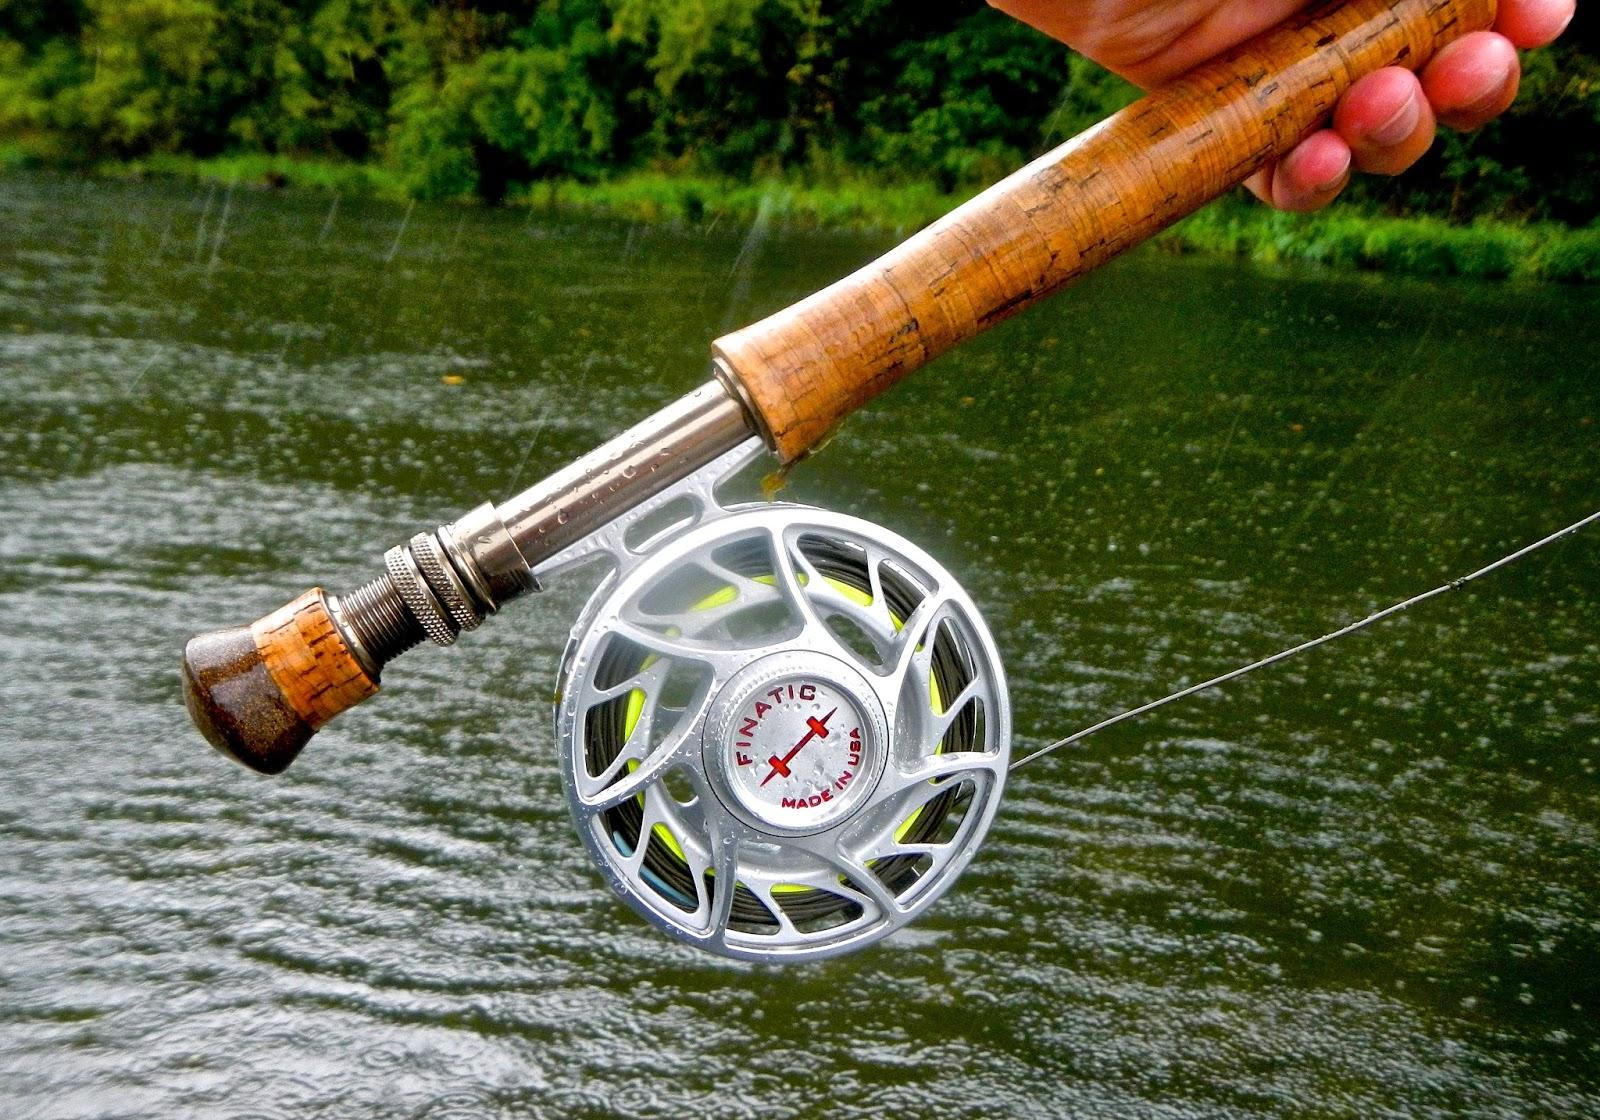 Brookville fishing report 8 31 14 delamere hopkins for Bucs fishing report